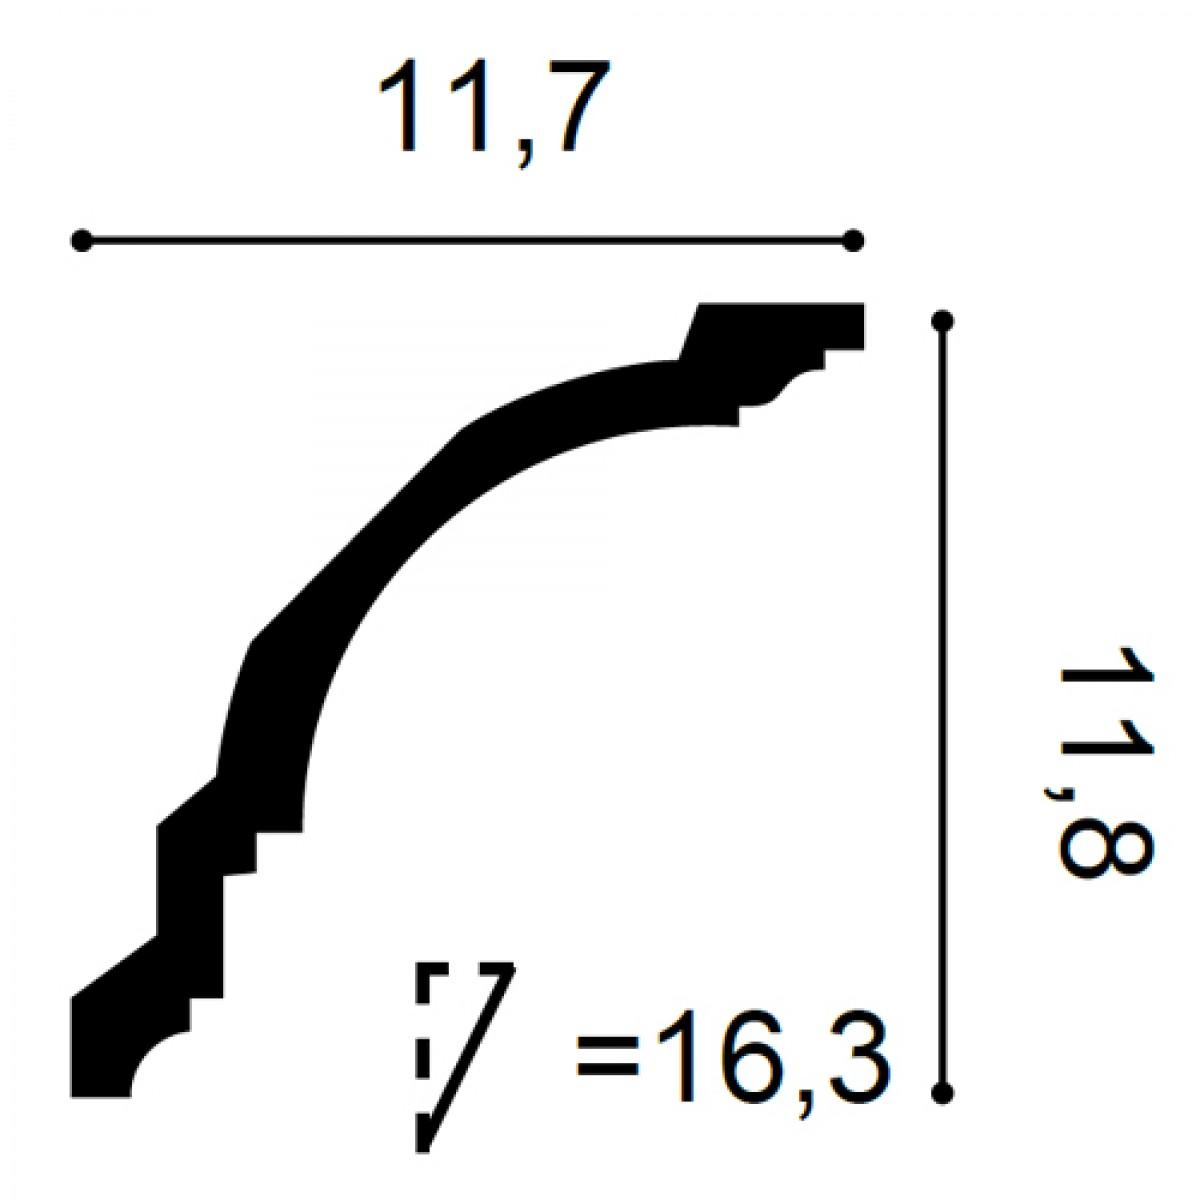 Cornisa Flex Axxent CX106F, Dimensiuni: 200 X 11.7 X 11.8 cm, Orac Decor